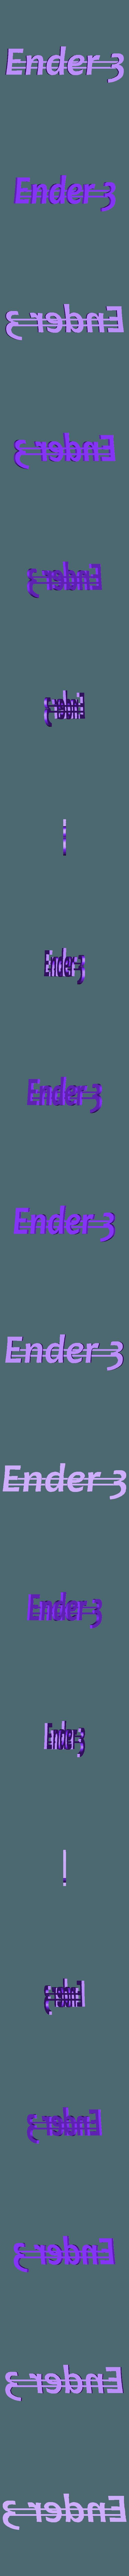 N%C3%A1pis.stl Download free STL file Display cases for Ender 3 and BIGTREETECH TFT35 V1.2 control panel TFT 3.5 v2 • 3D print model, michal0082